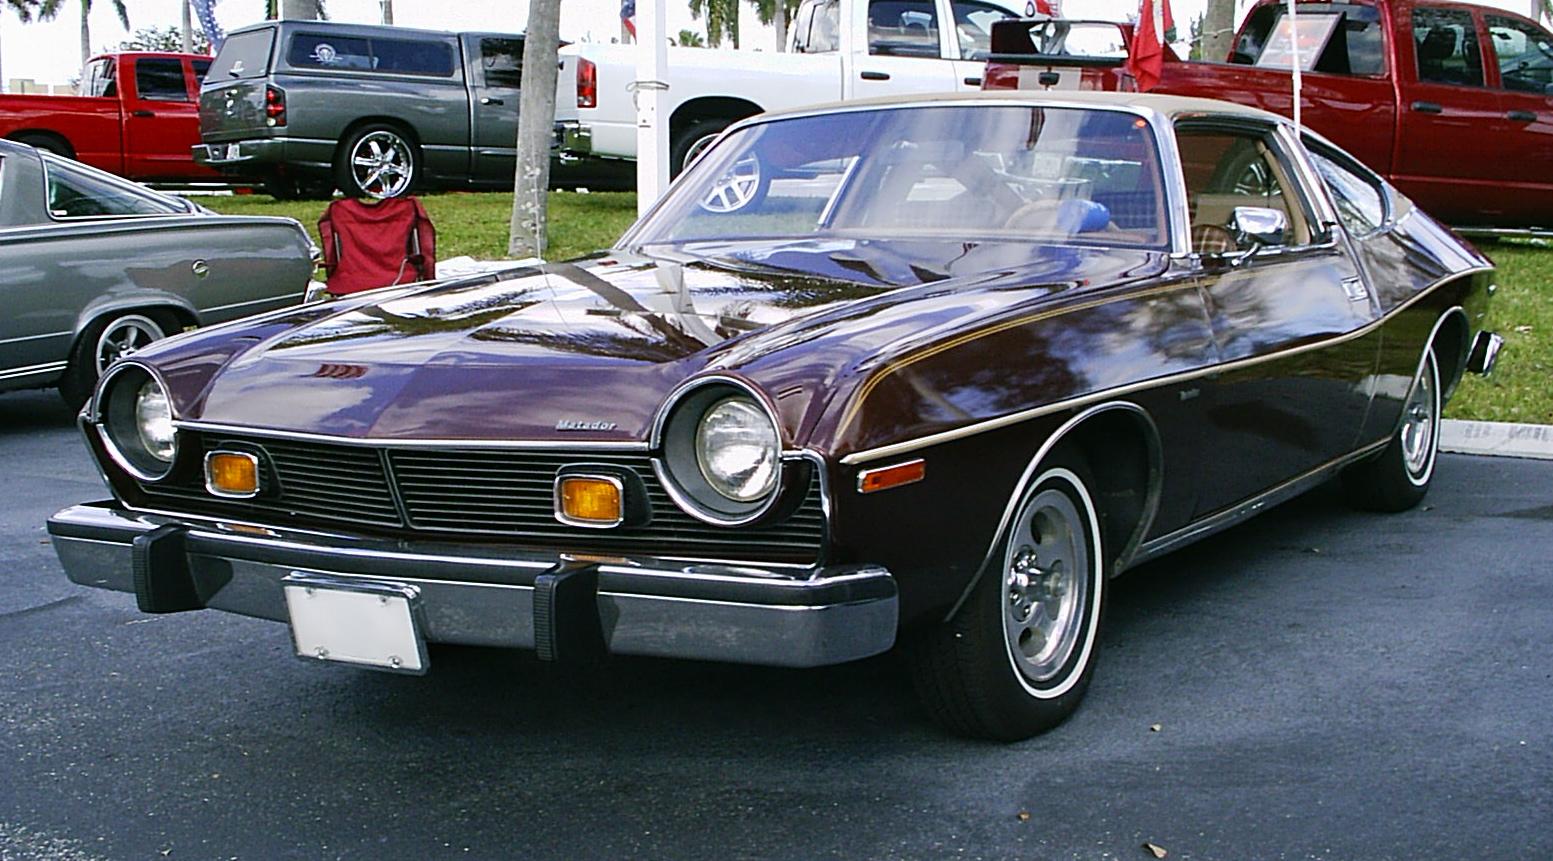 Luxury Amc Models List Image Collection - Classic Cars Ideas - boiq.info